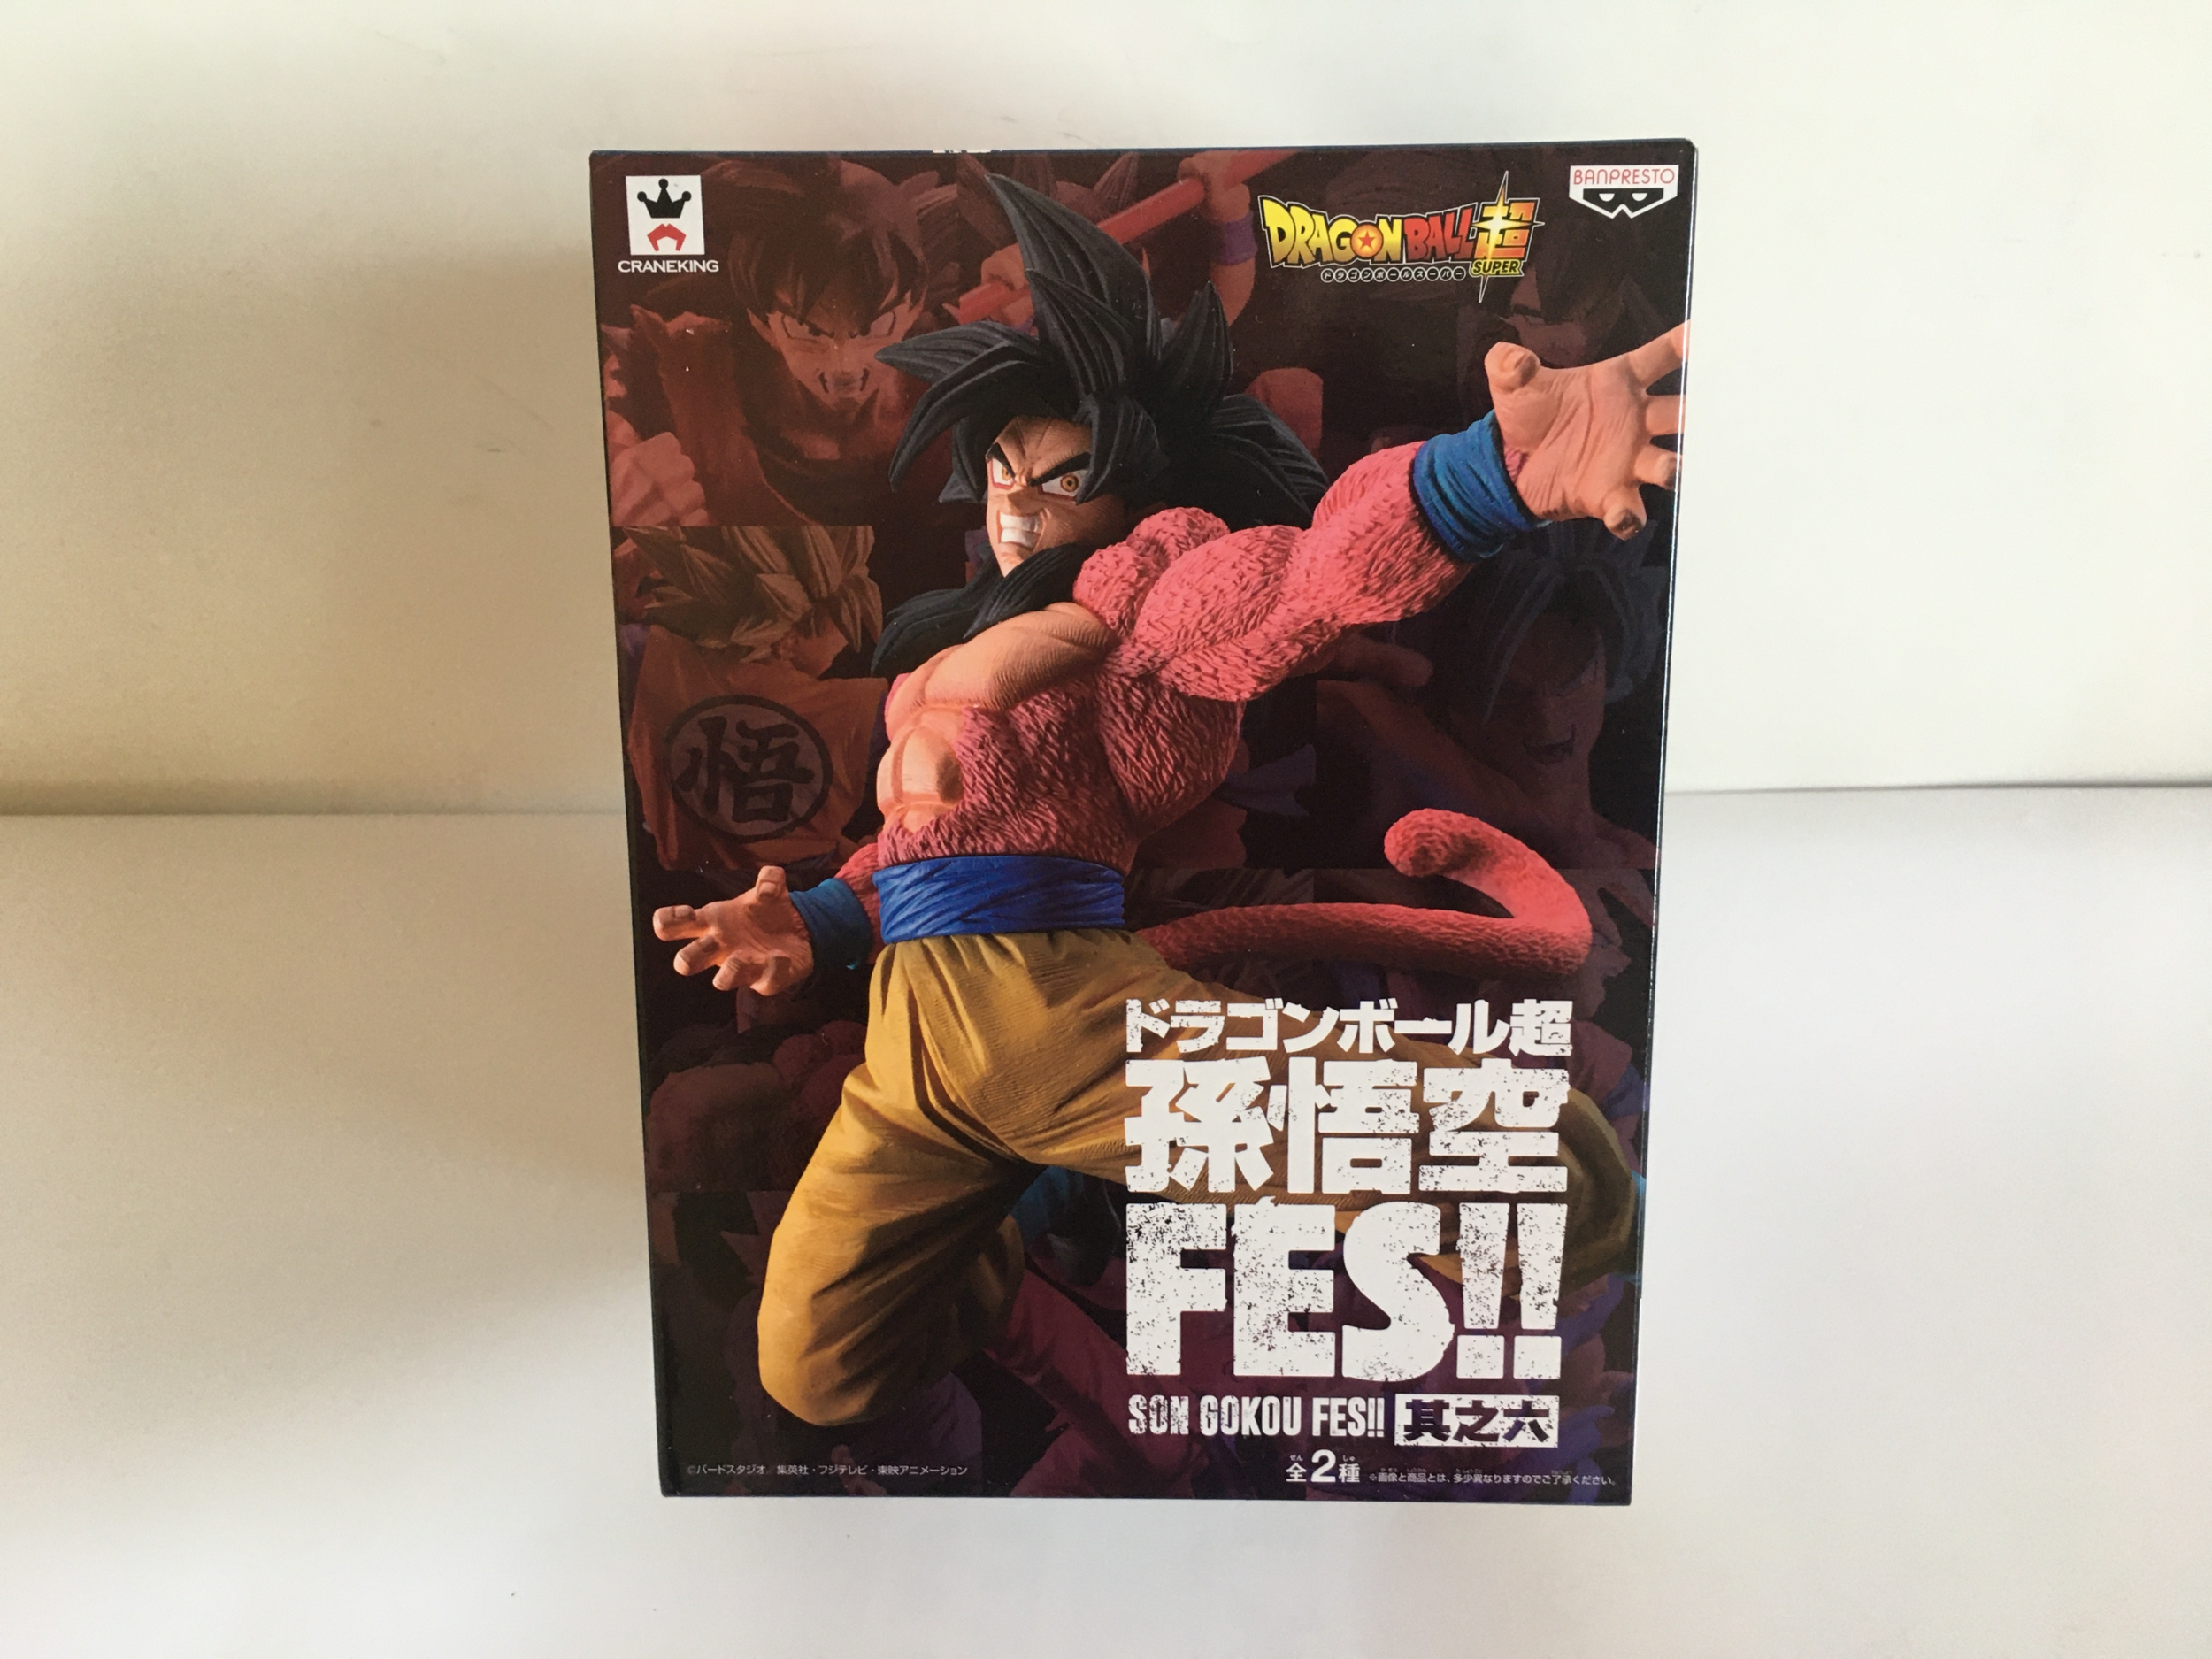 DRAGON BALL SUPER SON GOKU FES!! SERIES VOL.6 SUPER SAIYAN 4 SON